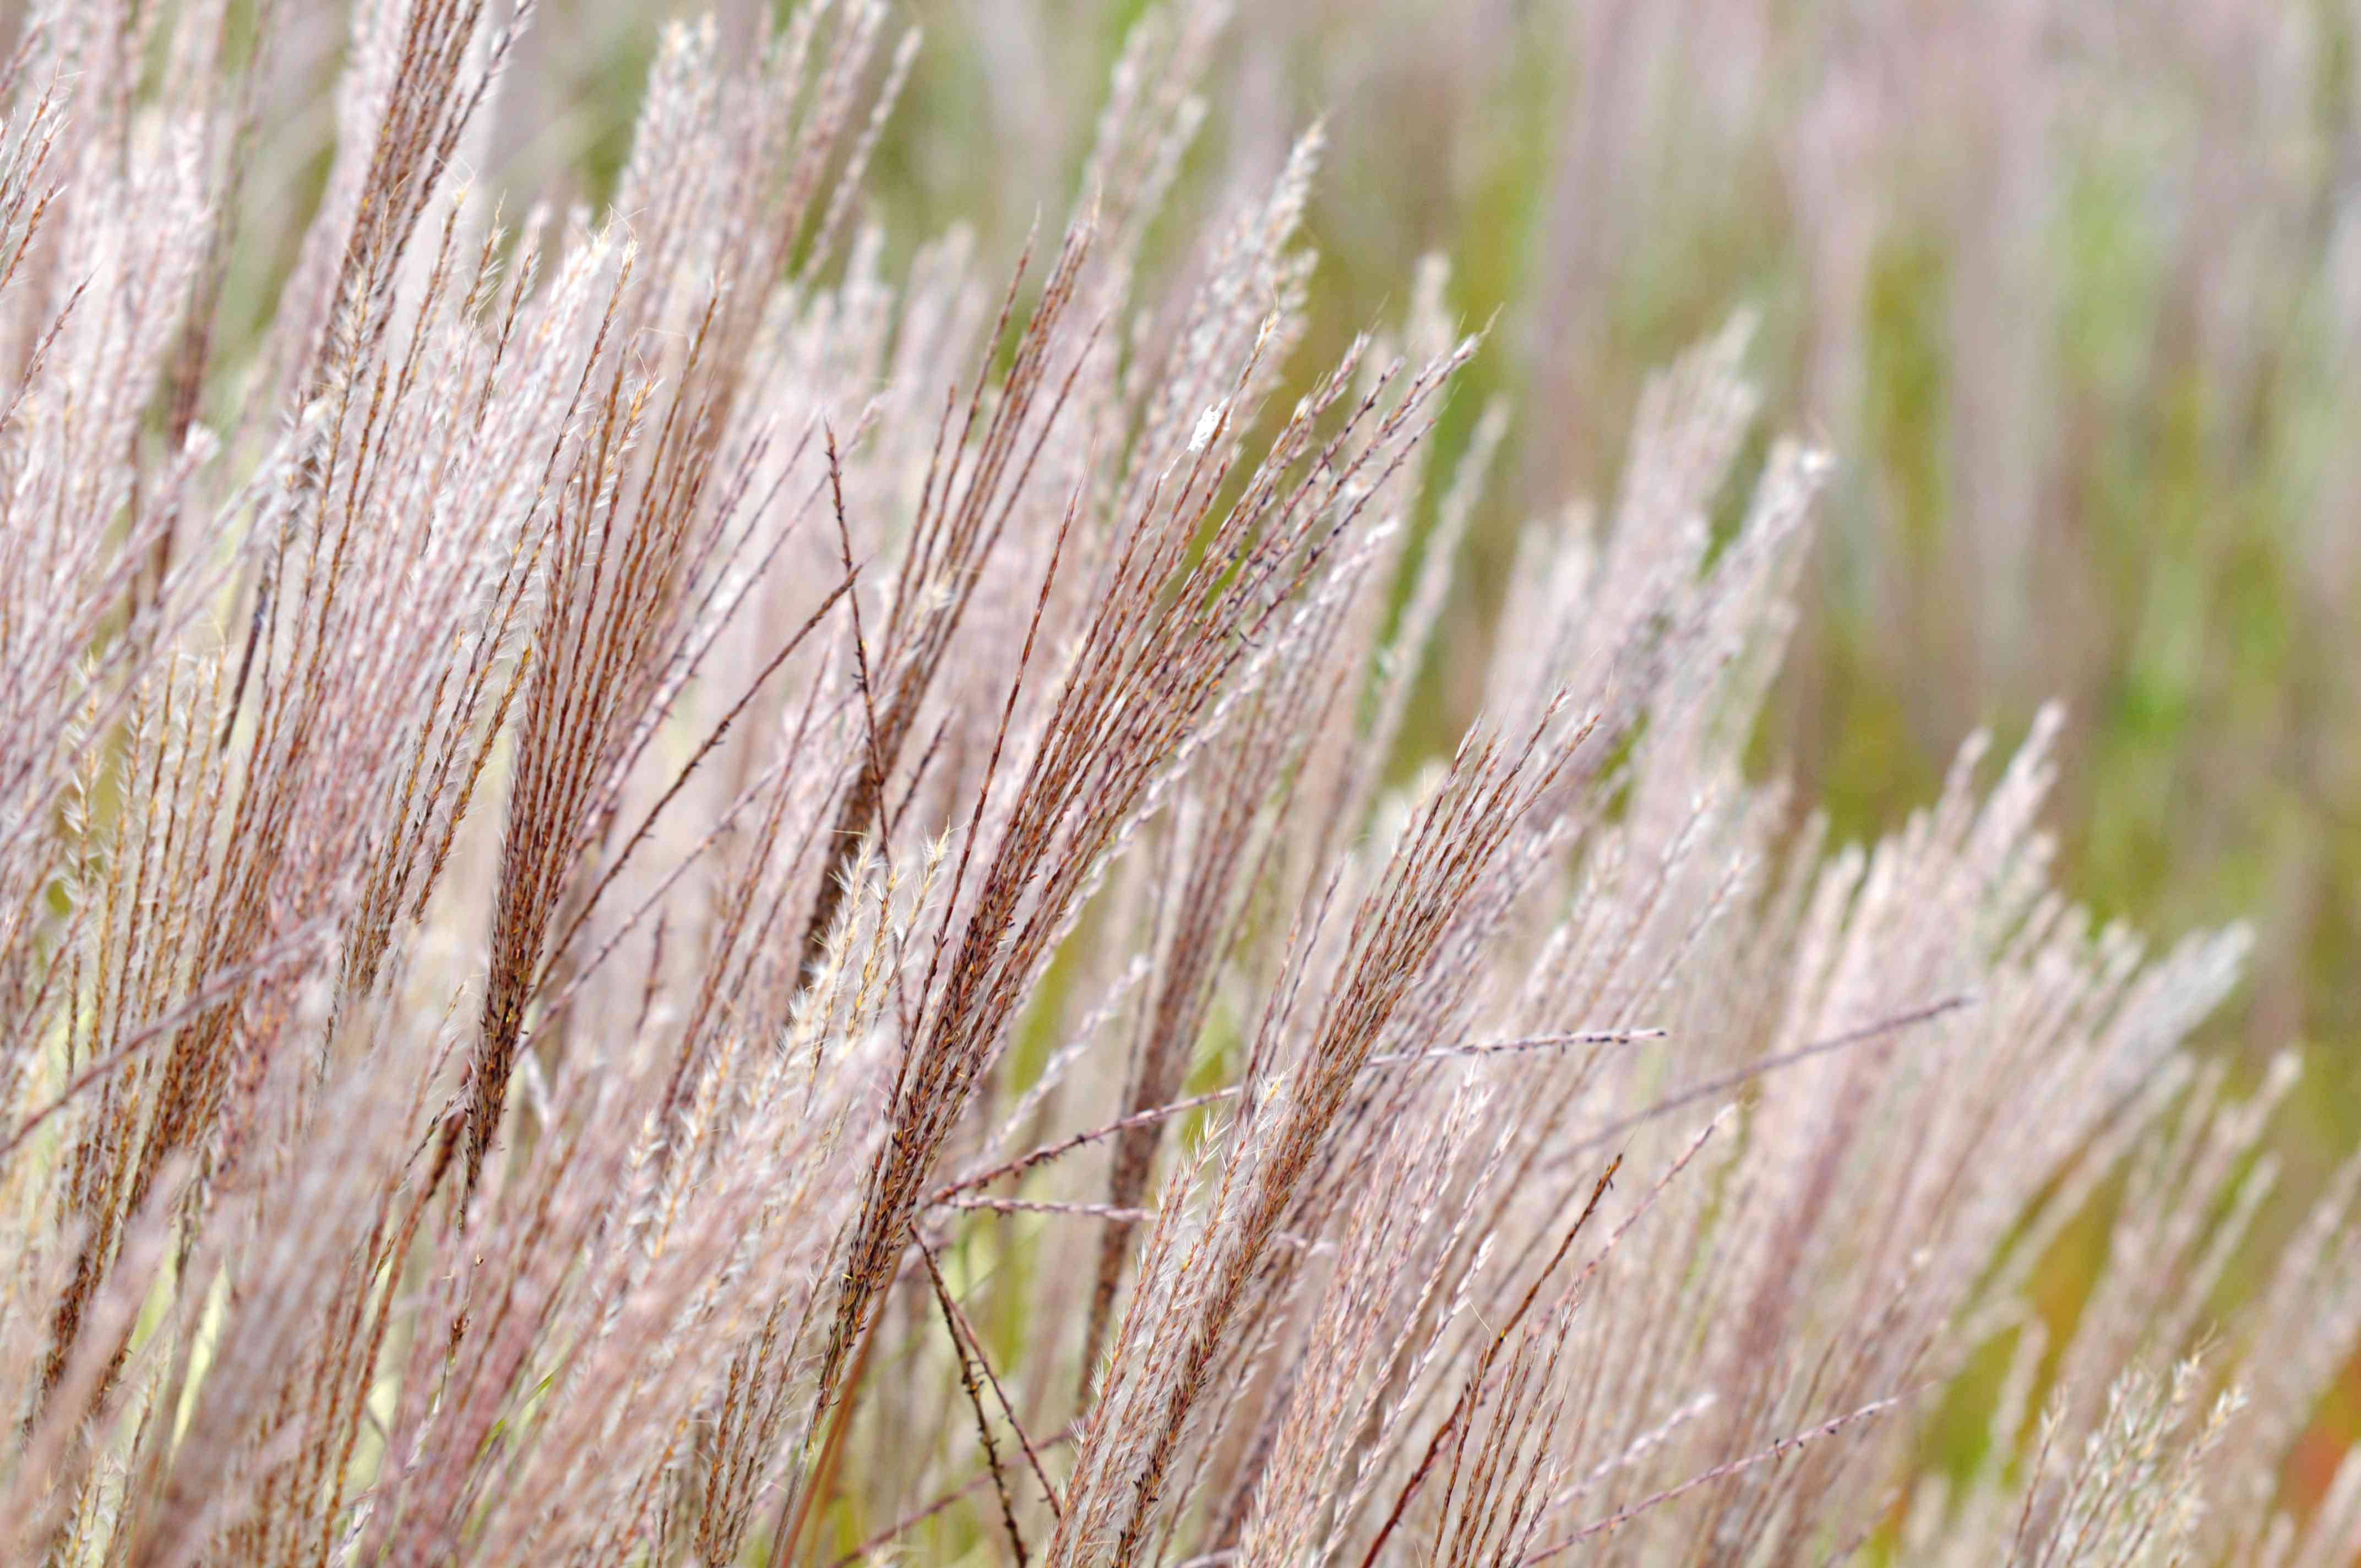 closeup of Japanese silver grass